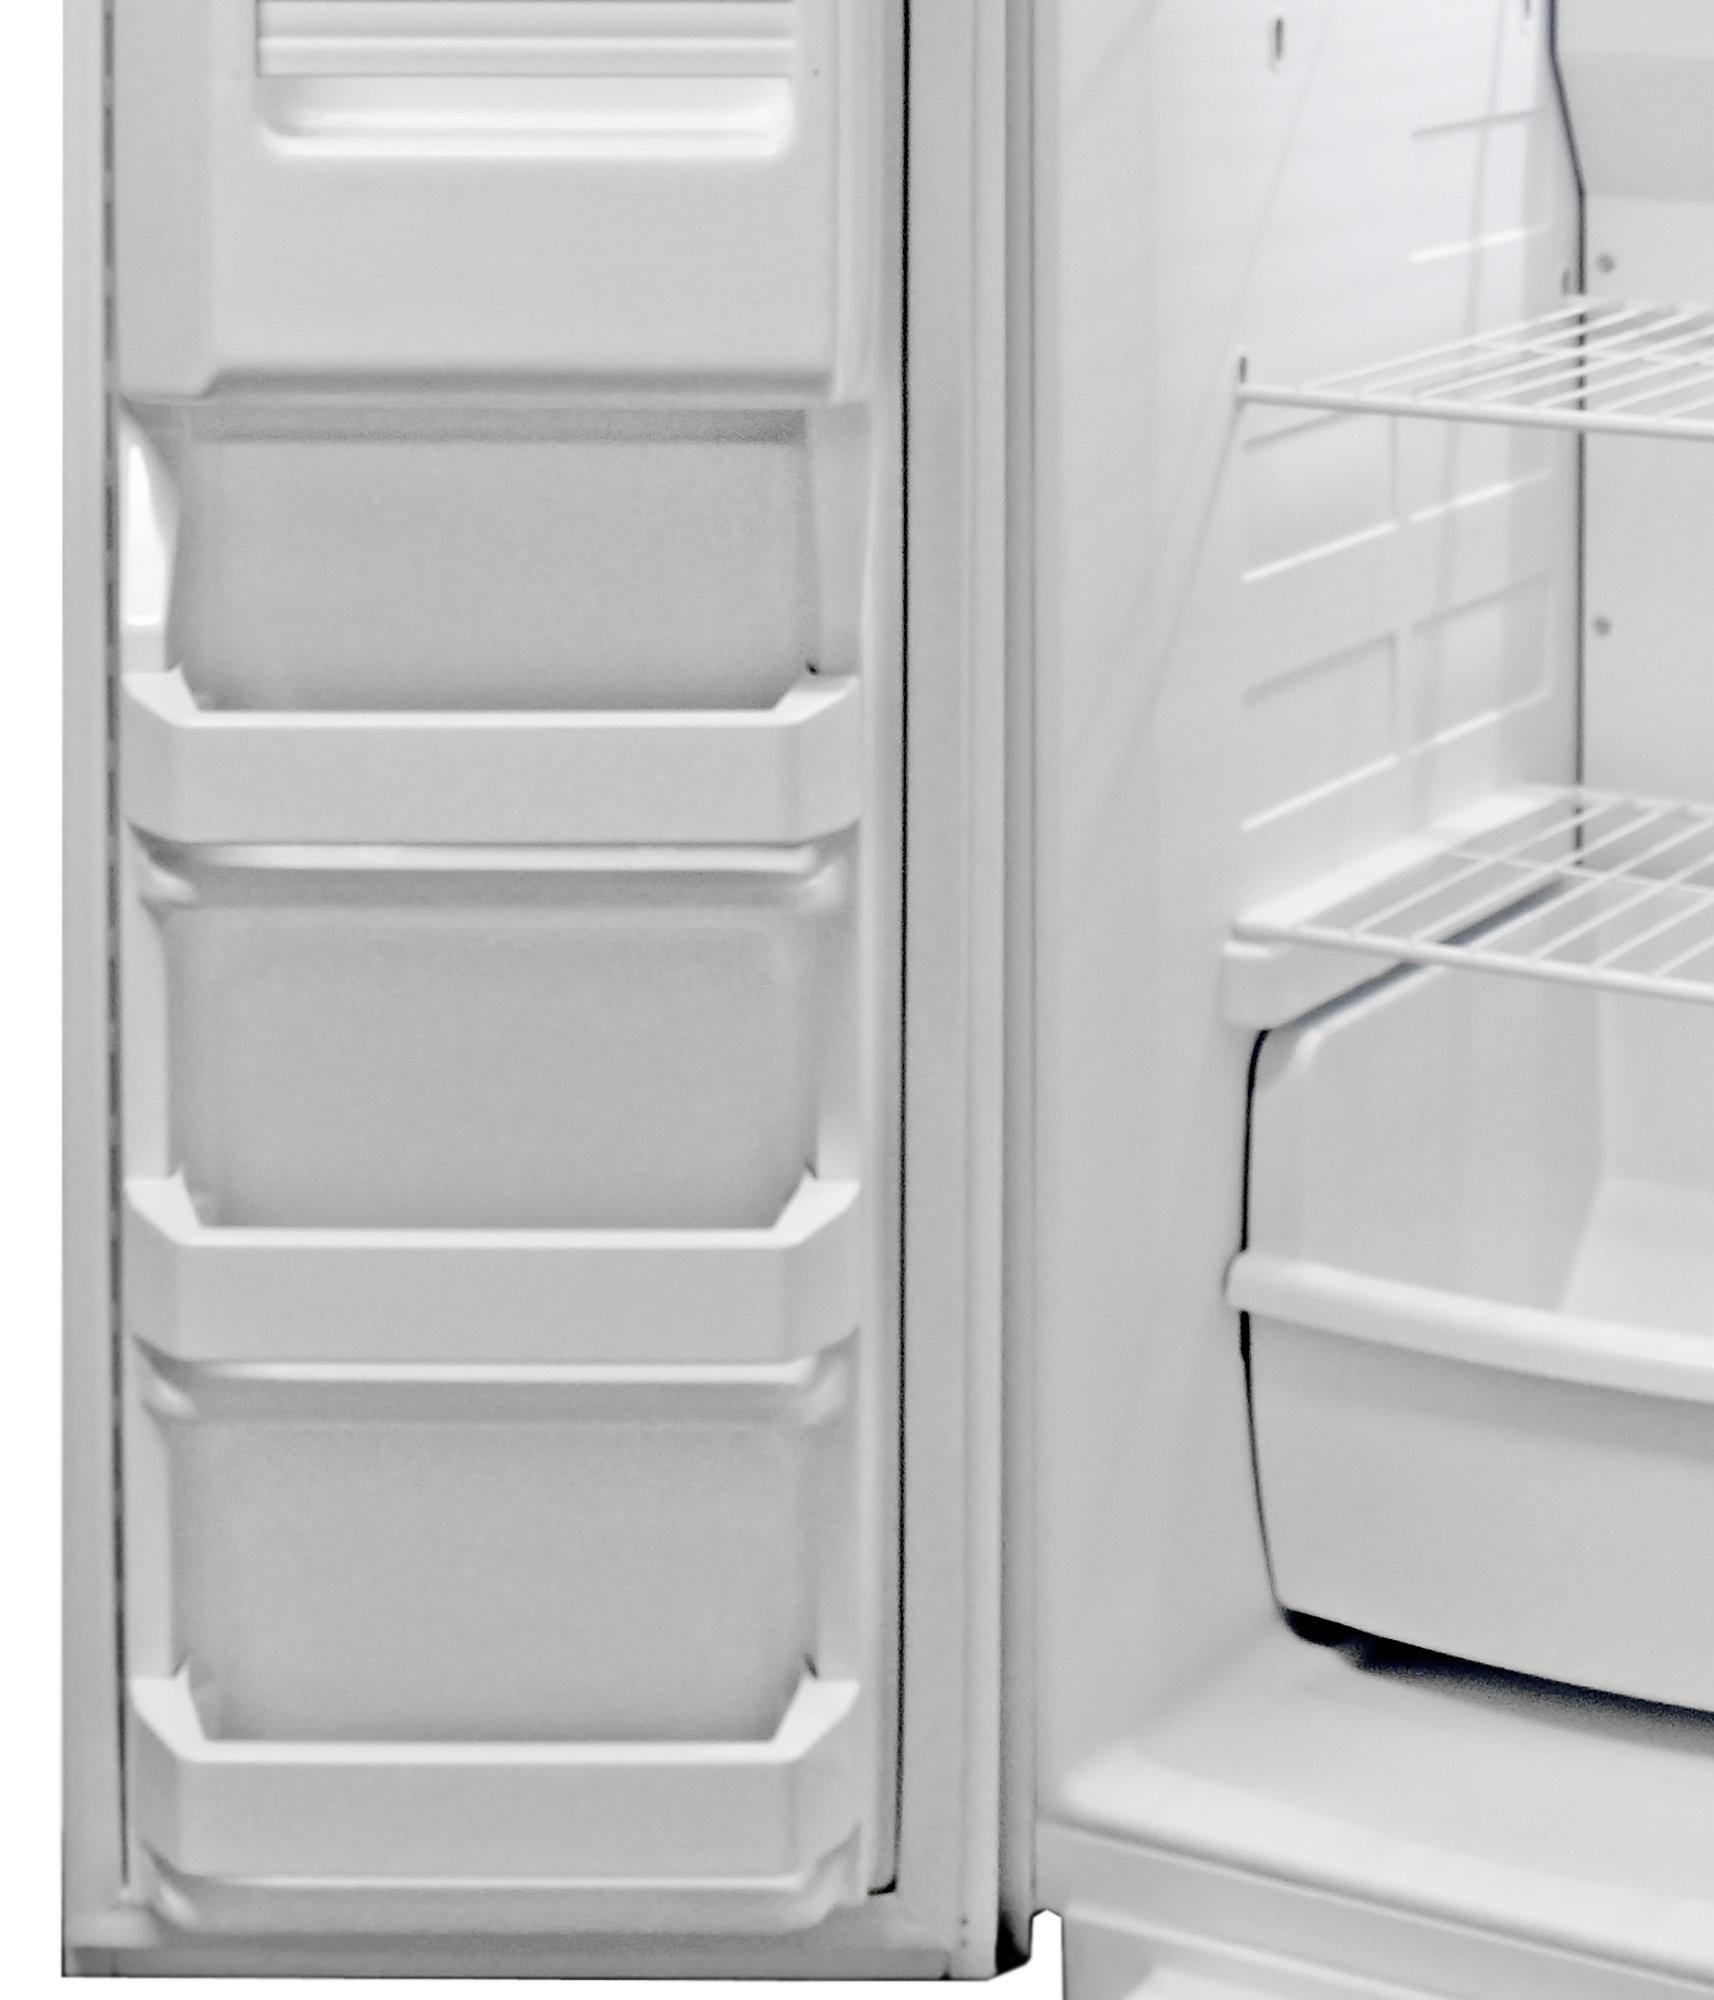 kenmore 51122 refrigerator review refrigerators. Black Bedroom Furniture Sets. Home Design Ideas